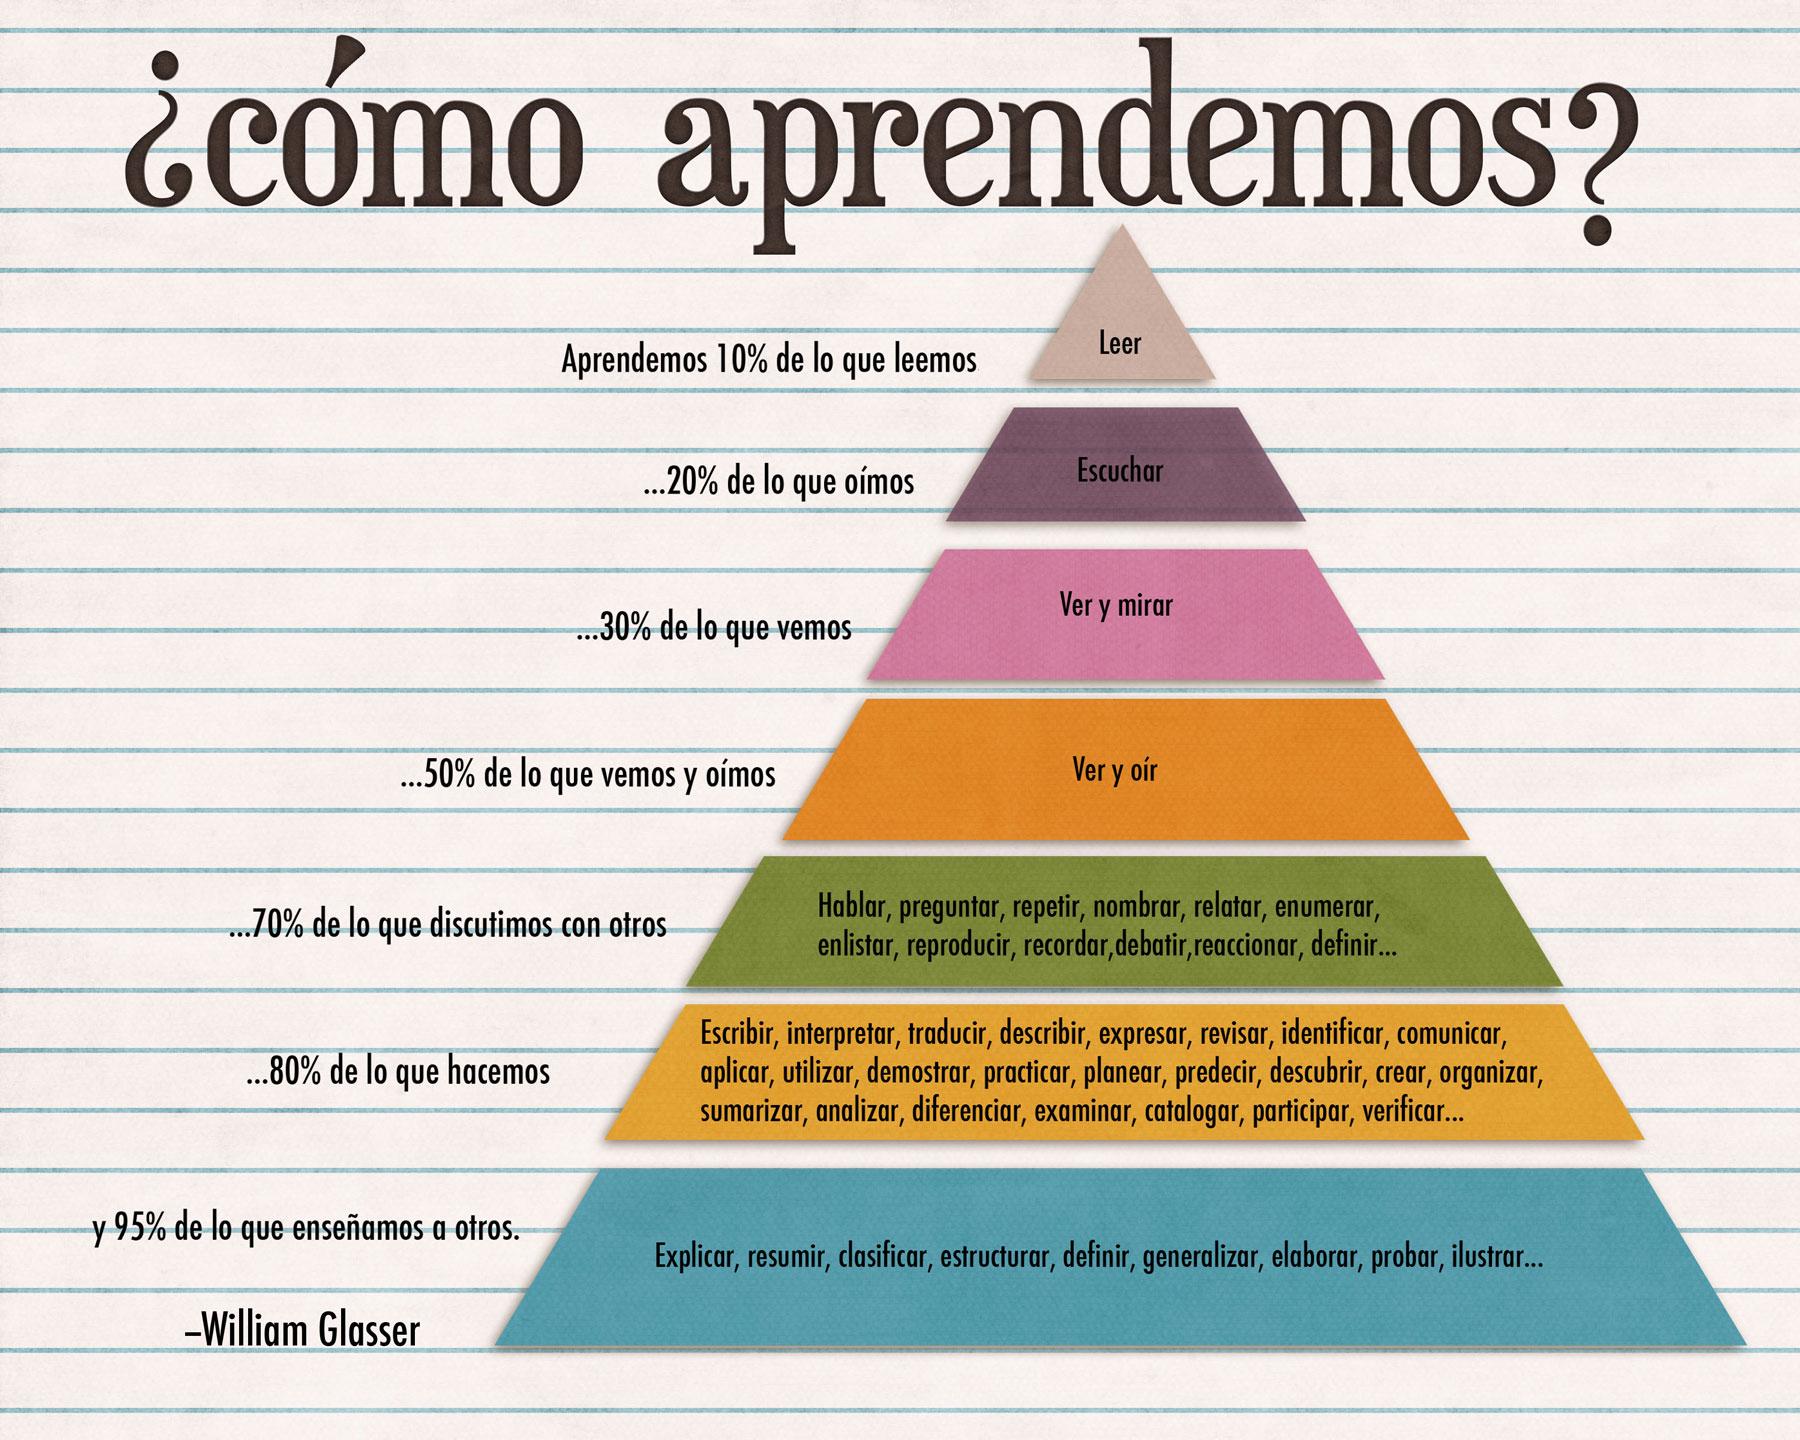 http://ochoamores.typepad.com/.a/6a00e55212613388330191047d503f970c-pi